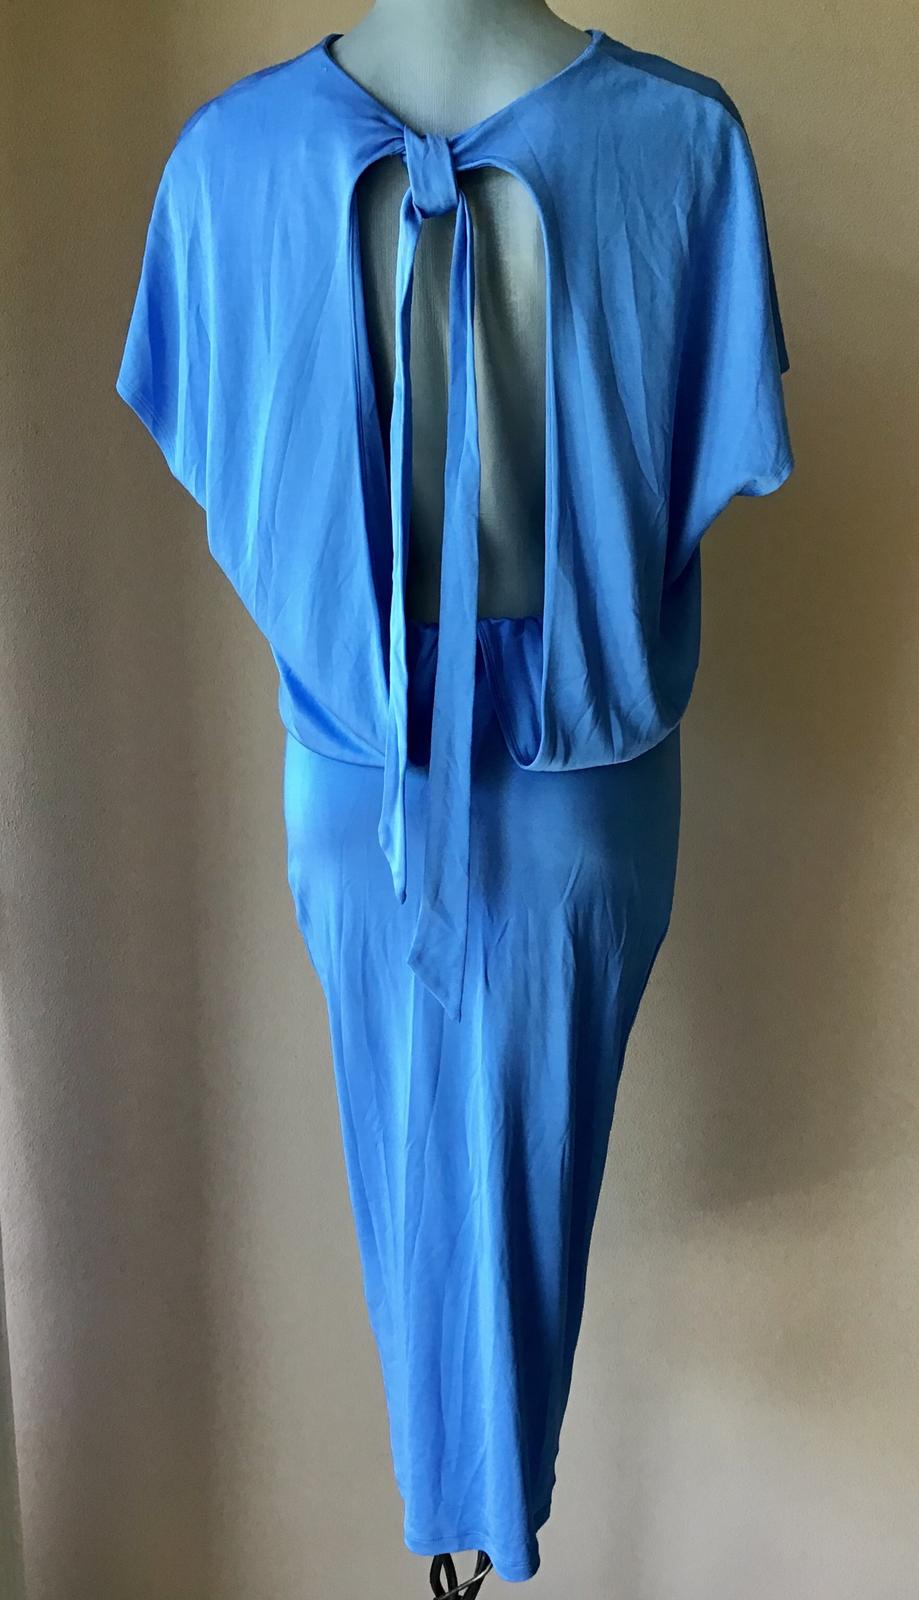 Šaty h&m - Obrázok č. 4